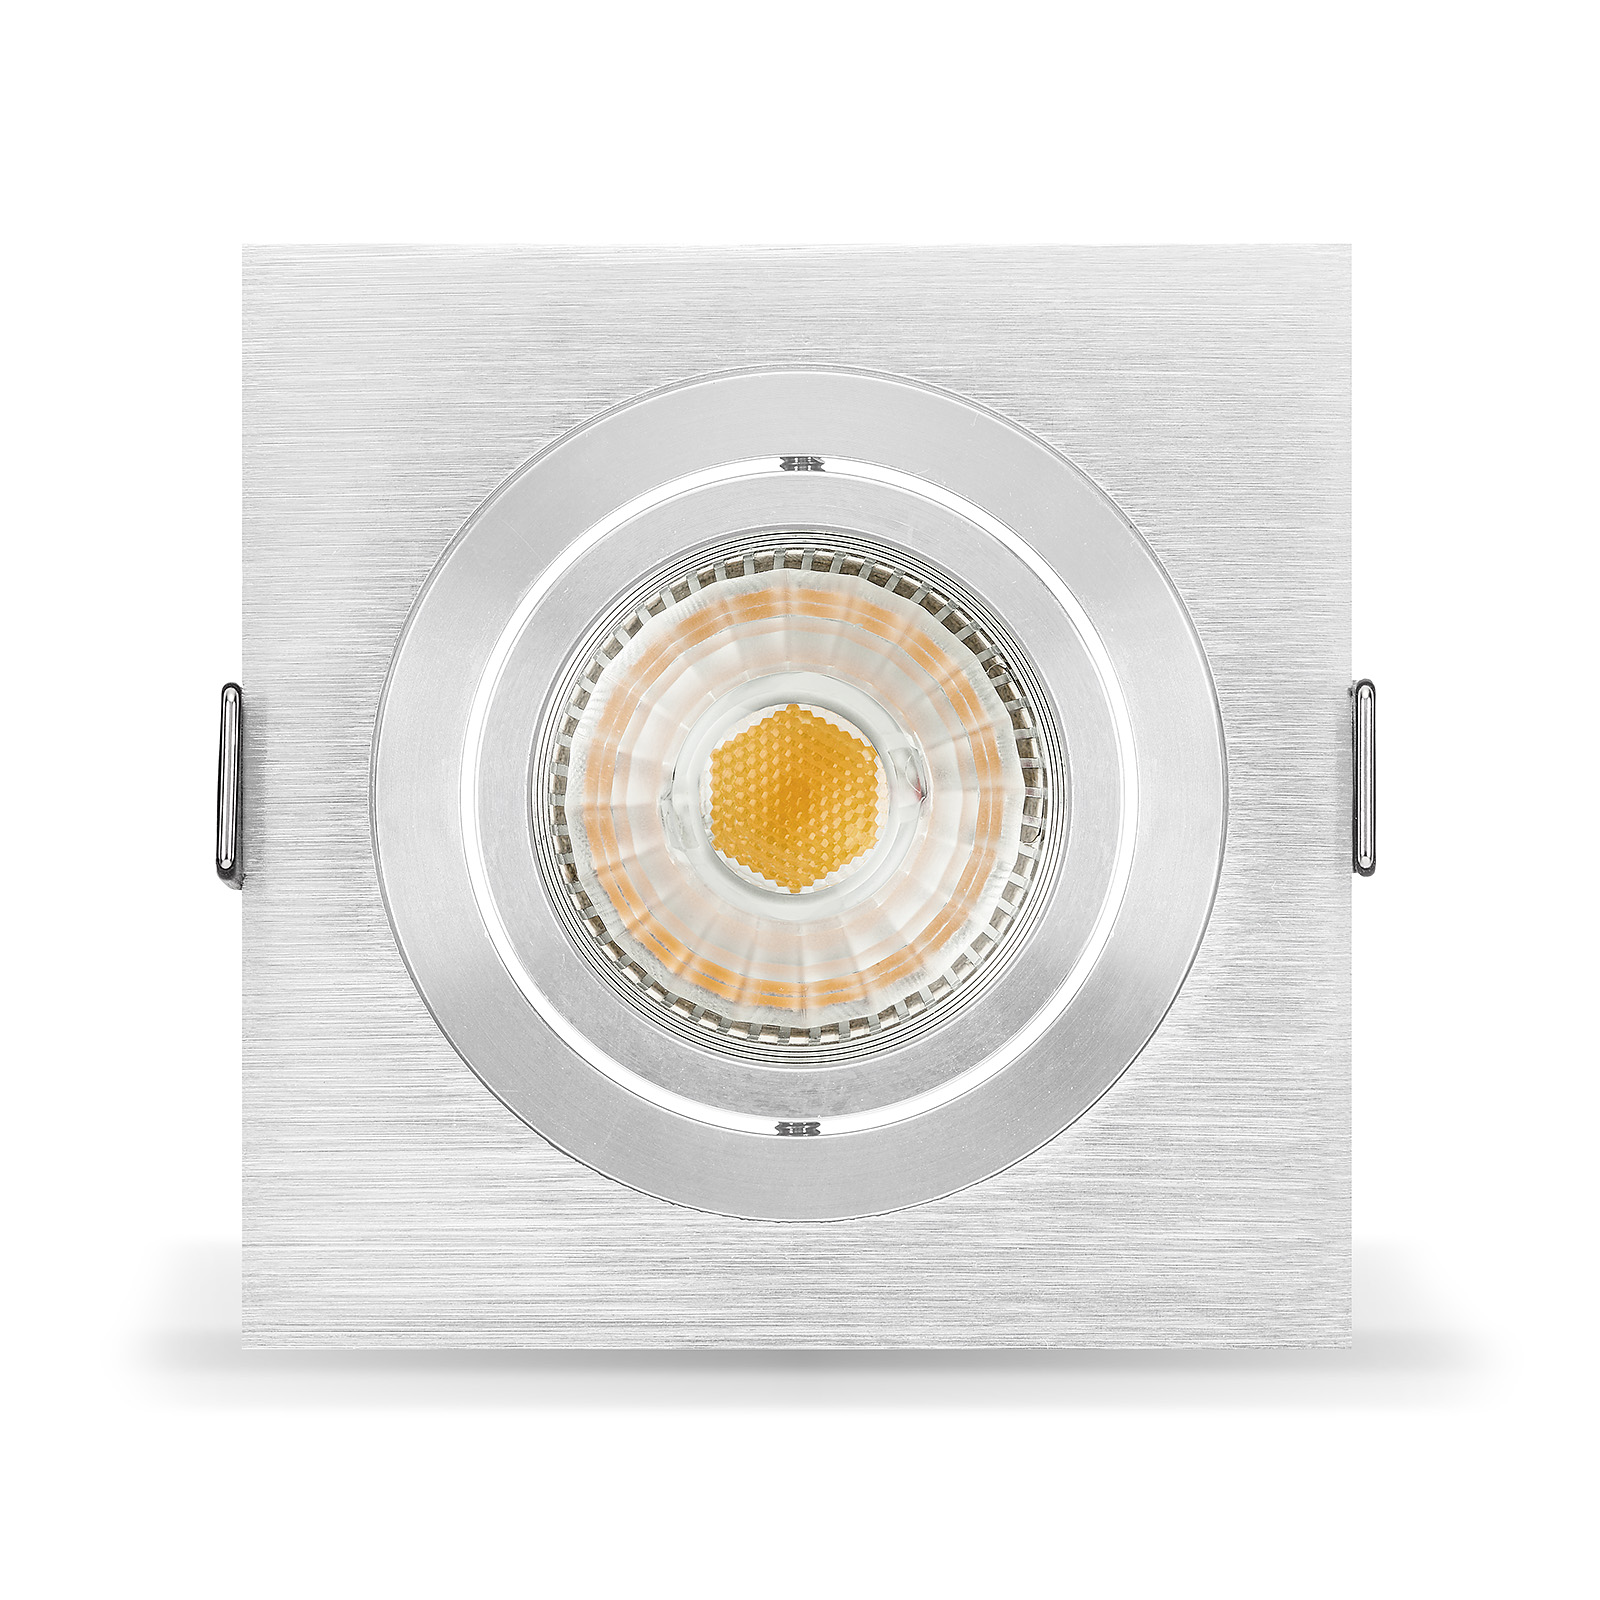 led einbaustrahler set von ledox dimmbar schwenkbar inkl einbaurahmen 230v 6w. Black Bedroom Furniture Sets. Home Design Ideas